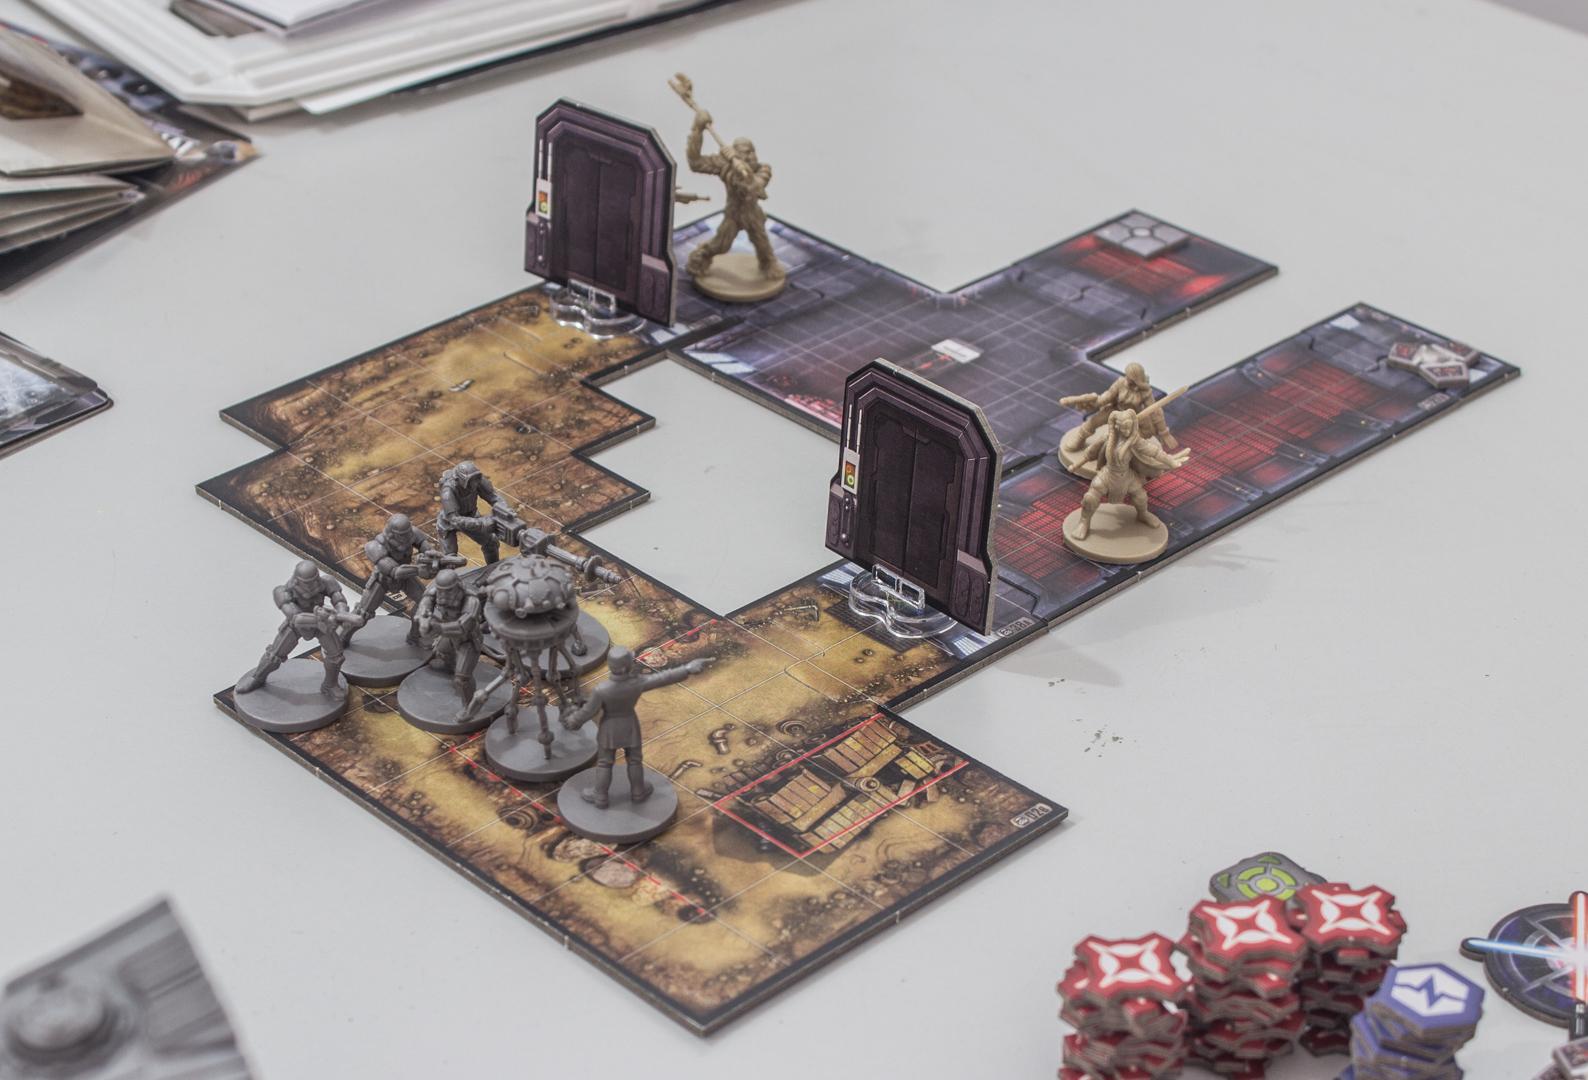 Paul's Star Wars Miniatures: Star Wars Imperial Assault Photos - Star Wars Miniatures Printable Maps